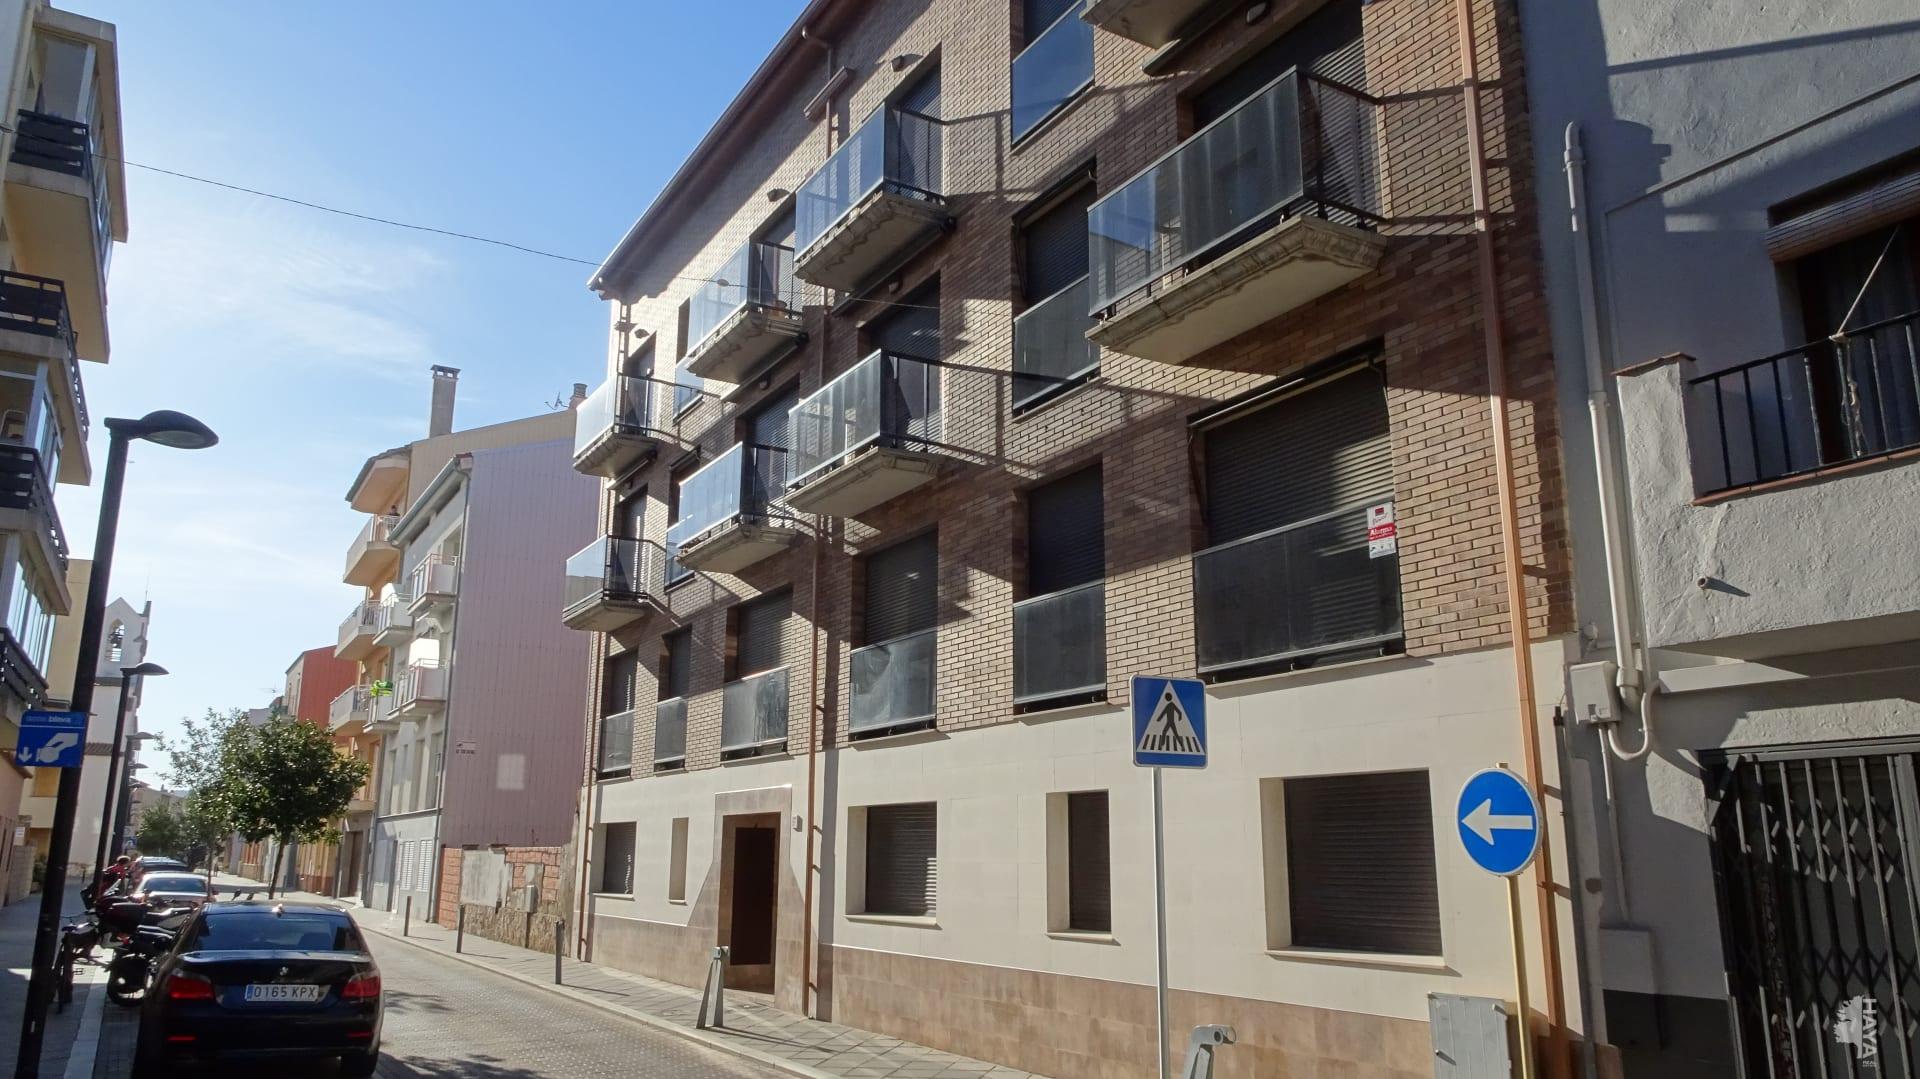 Piso en venta en Calonge, Girona, Calle D`artur Mundet, 116.000 €, 1 habitación, 1 baño, 44 m2